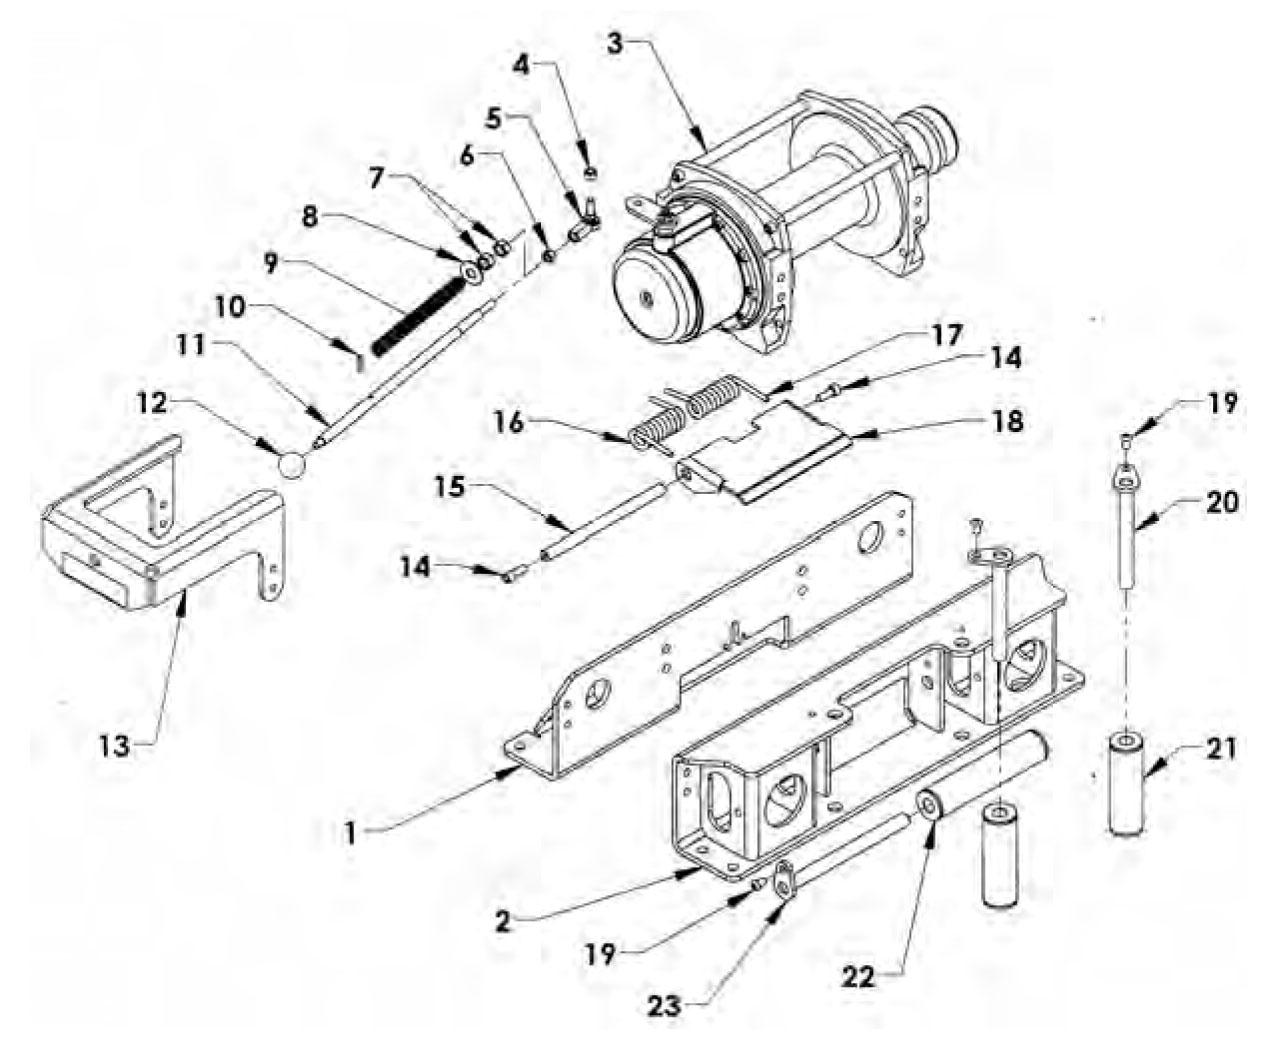 warn winch wiring diagram xd9000i label the eye answers rocker switch free download daystar